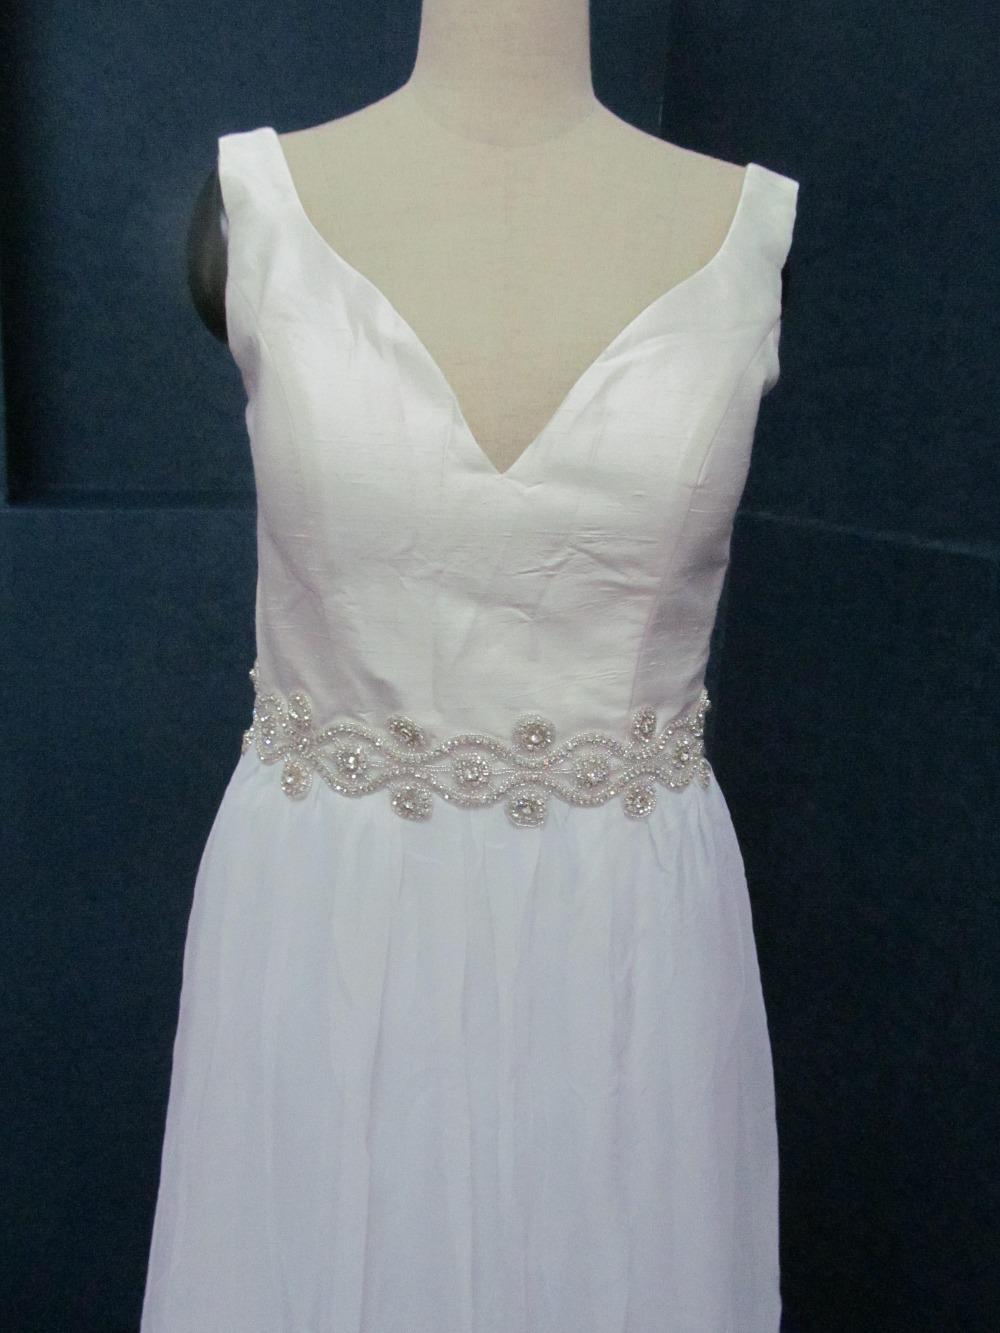 Fashion Sew On Cloth High QualityCrystal rhinestones Mesh Trim Silver 5yards wedding belts Sashes swarovski rhinestones Applique(China (Mainland))